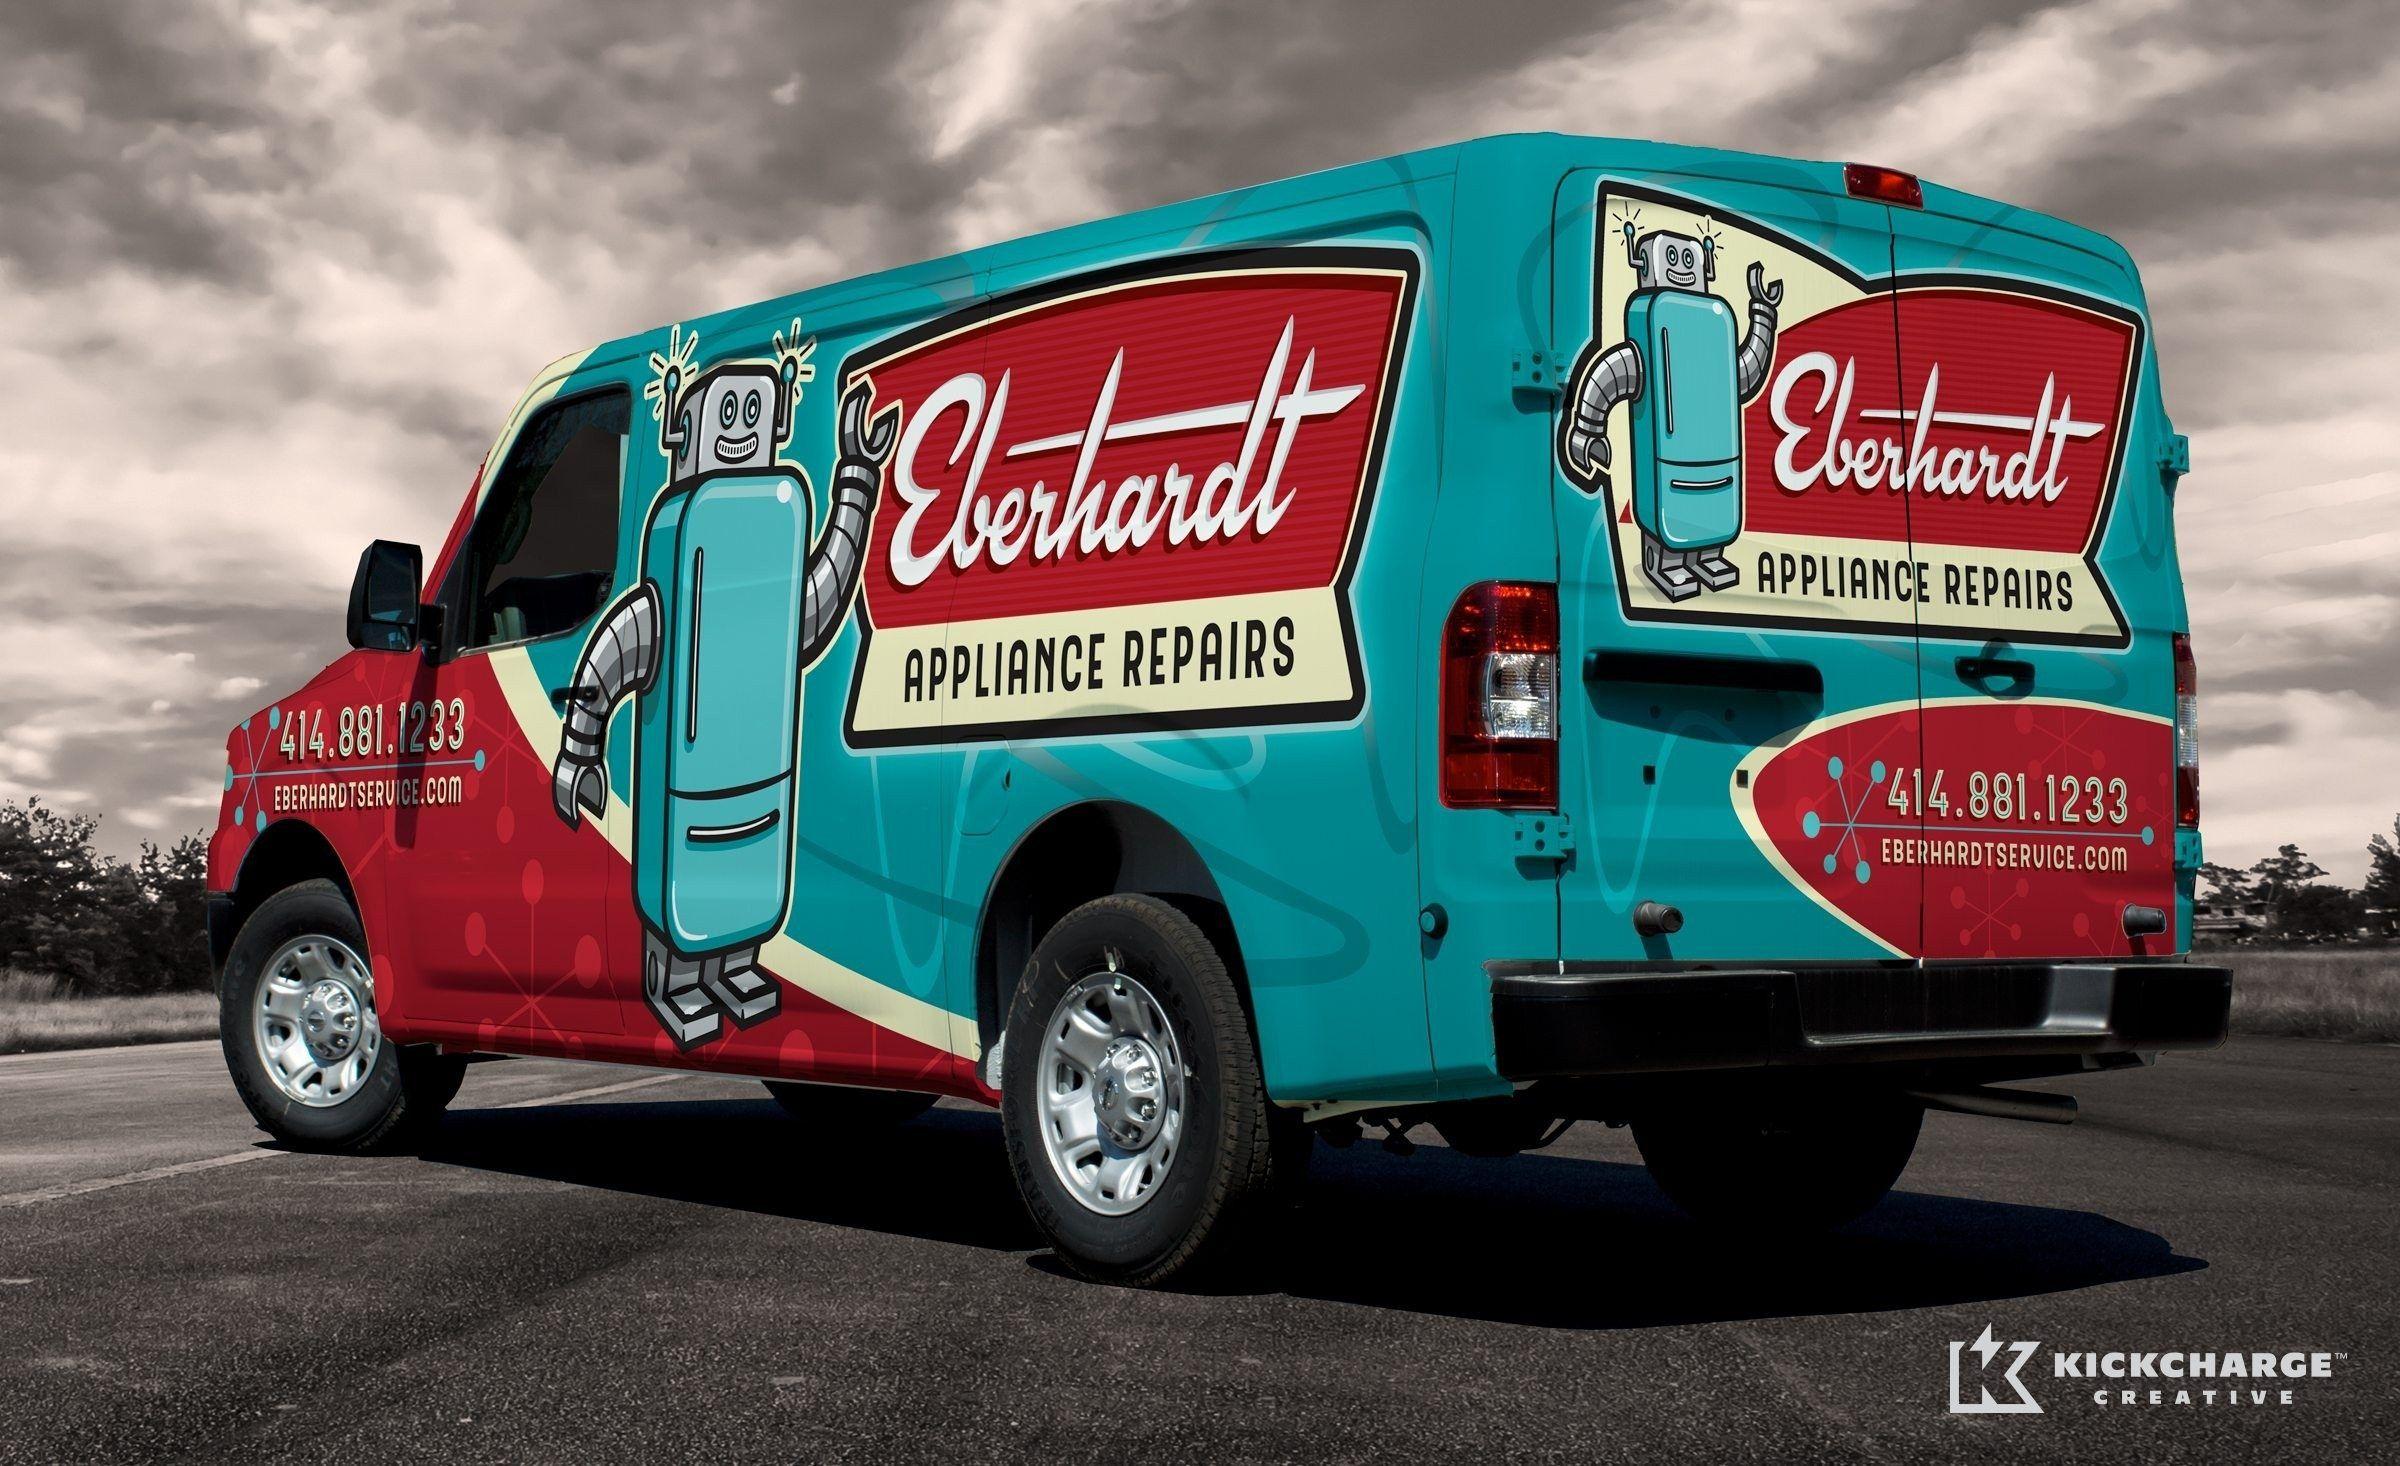 Eberhardt Appliance Repairs Kickcharge Creative Car Wrap Car